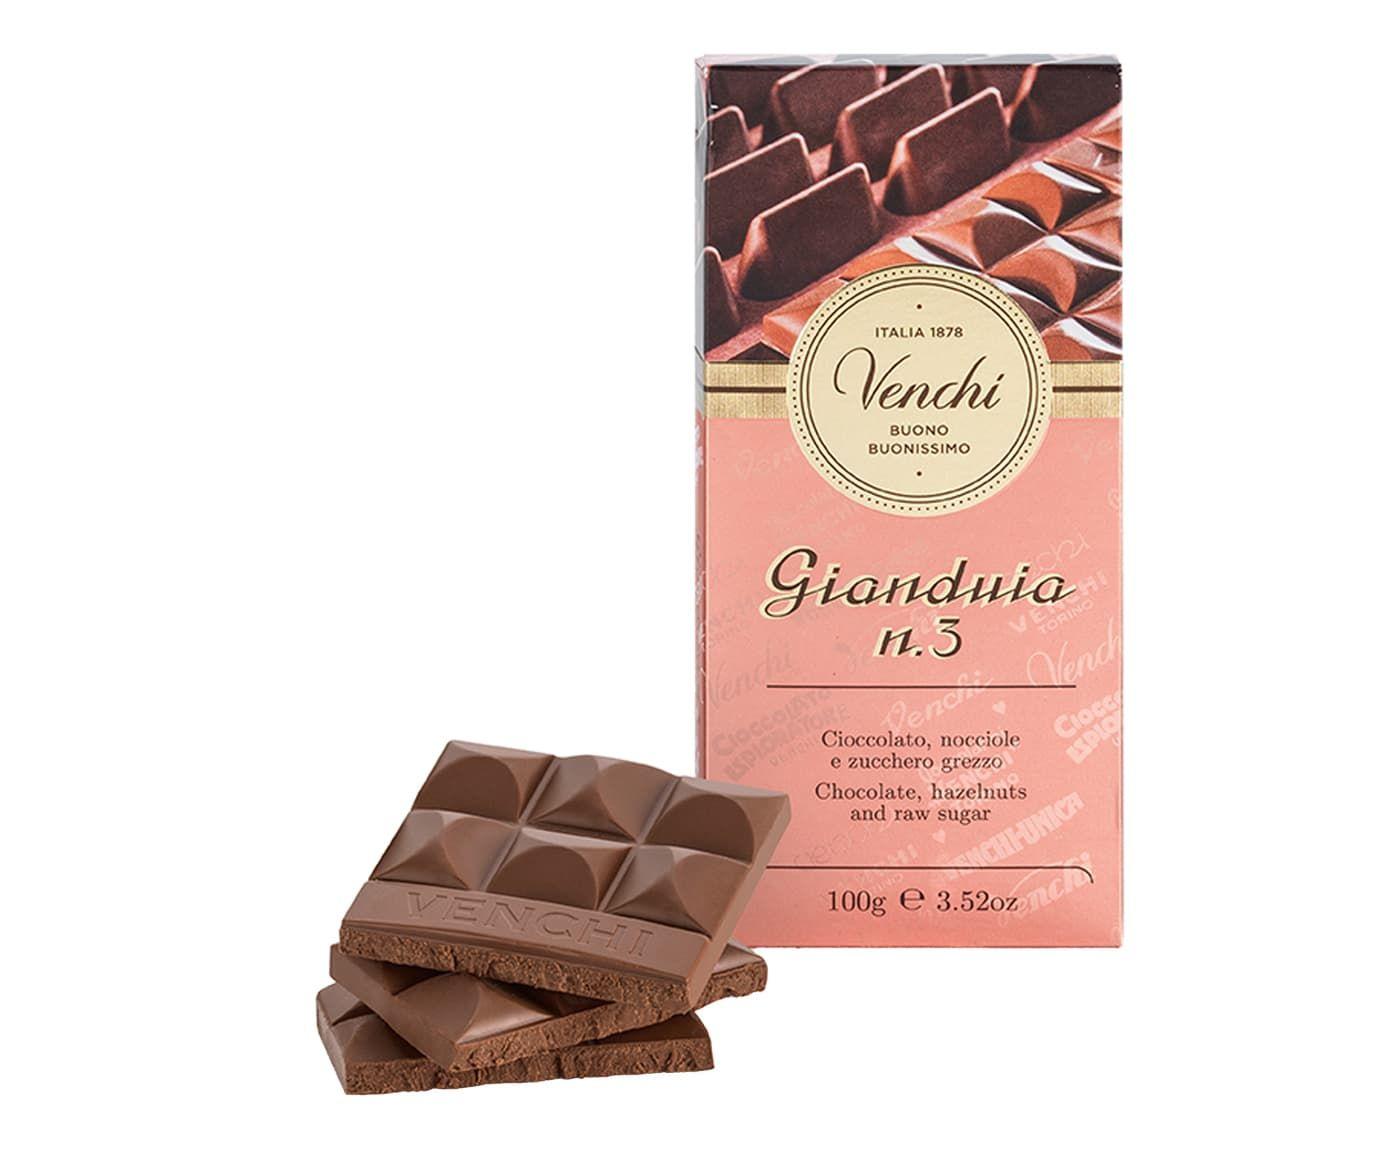 Barra de Chocolate Gianduitto - 100G | Westwing.com.br